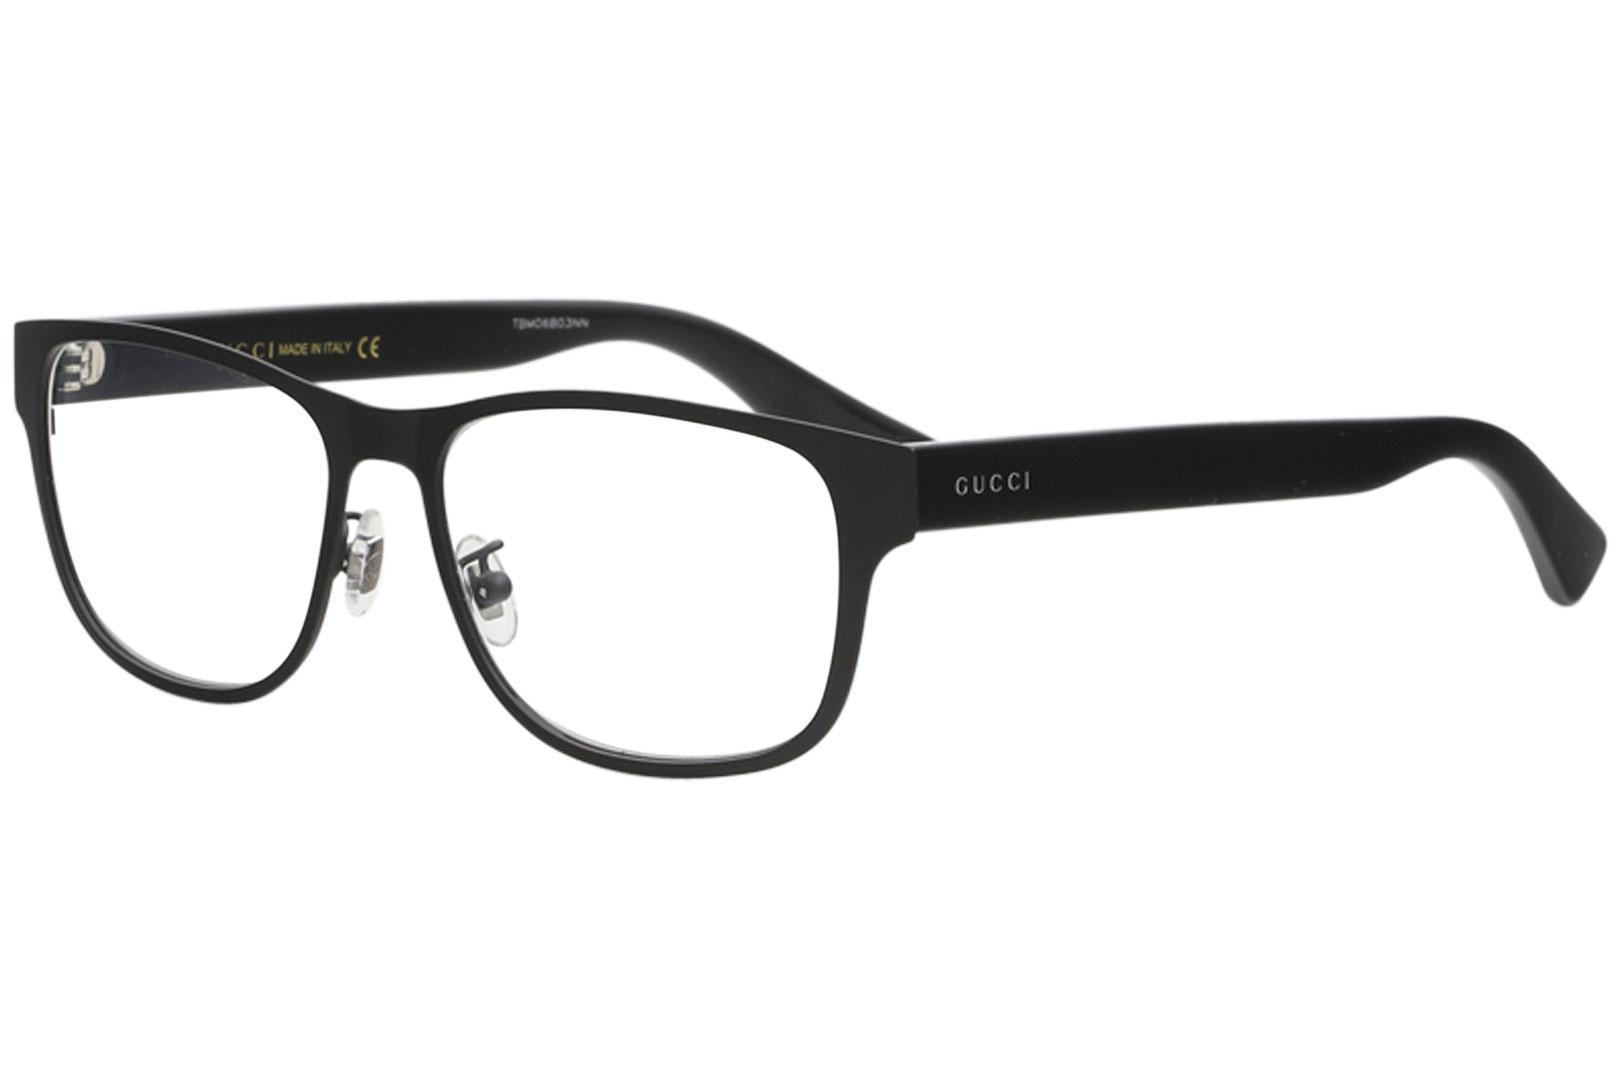 96bae07d9a15 Gucci Men's Eyeglasses GG0007O GG/0007/O Full Rim Optical Frame by Gucci